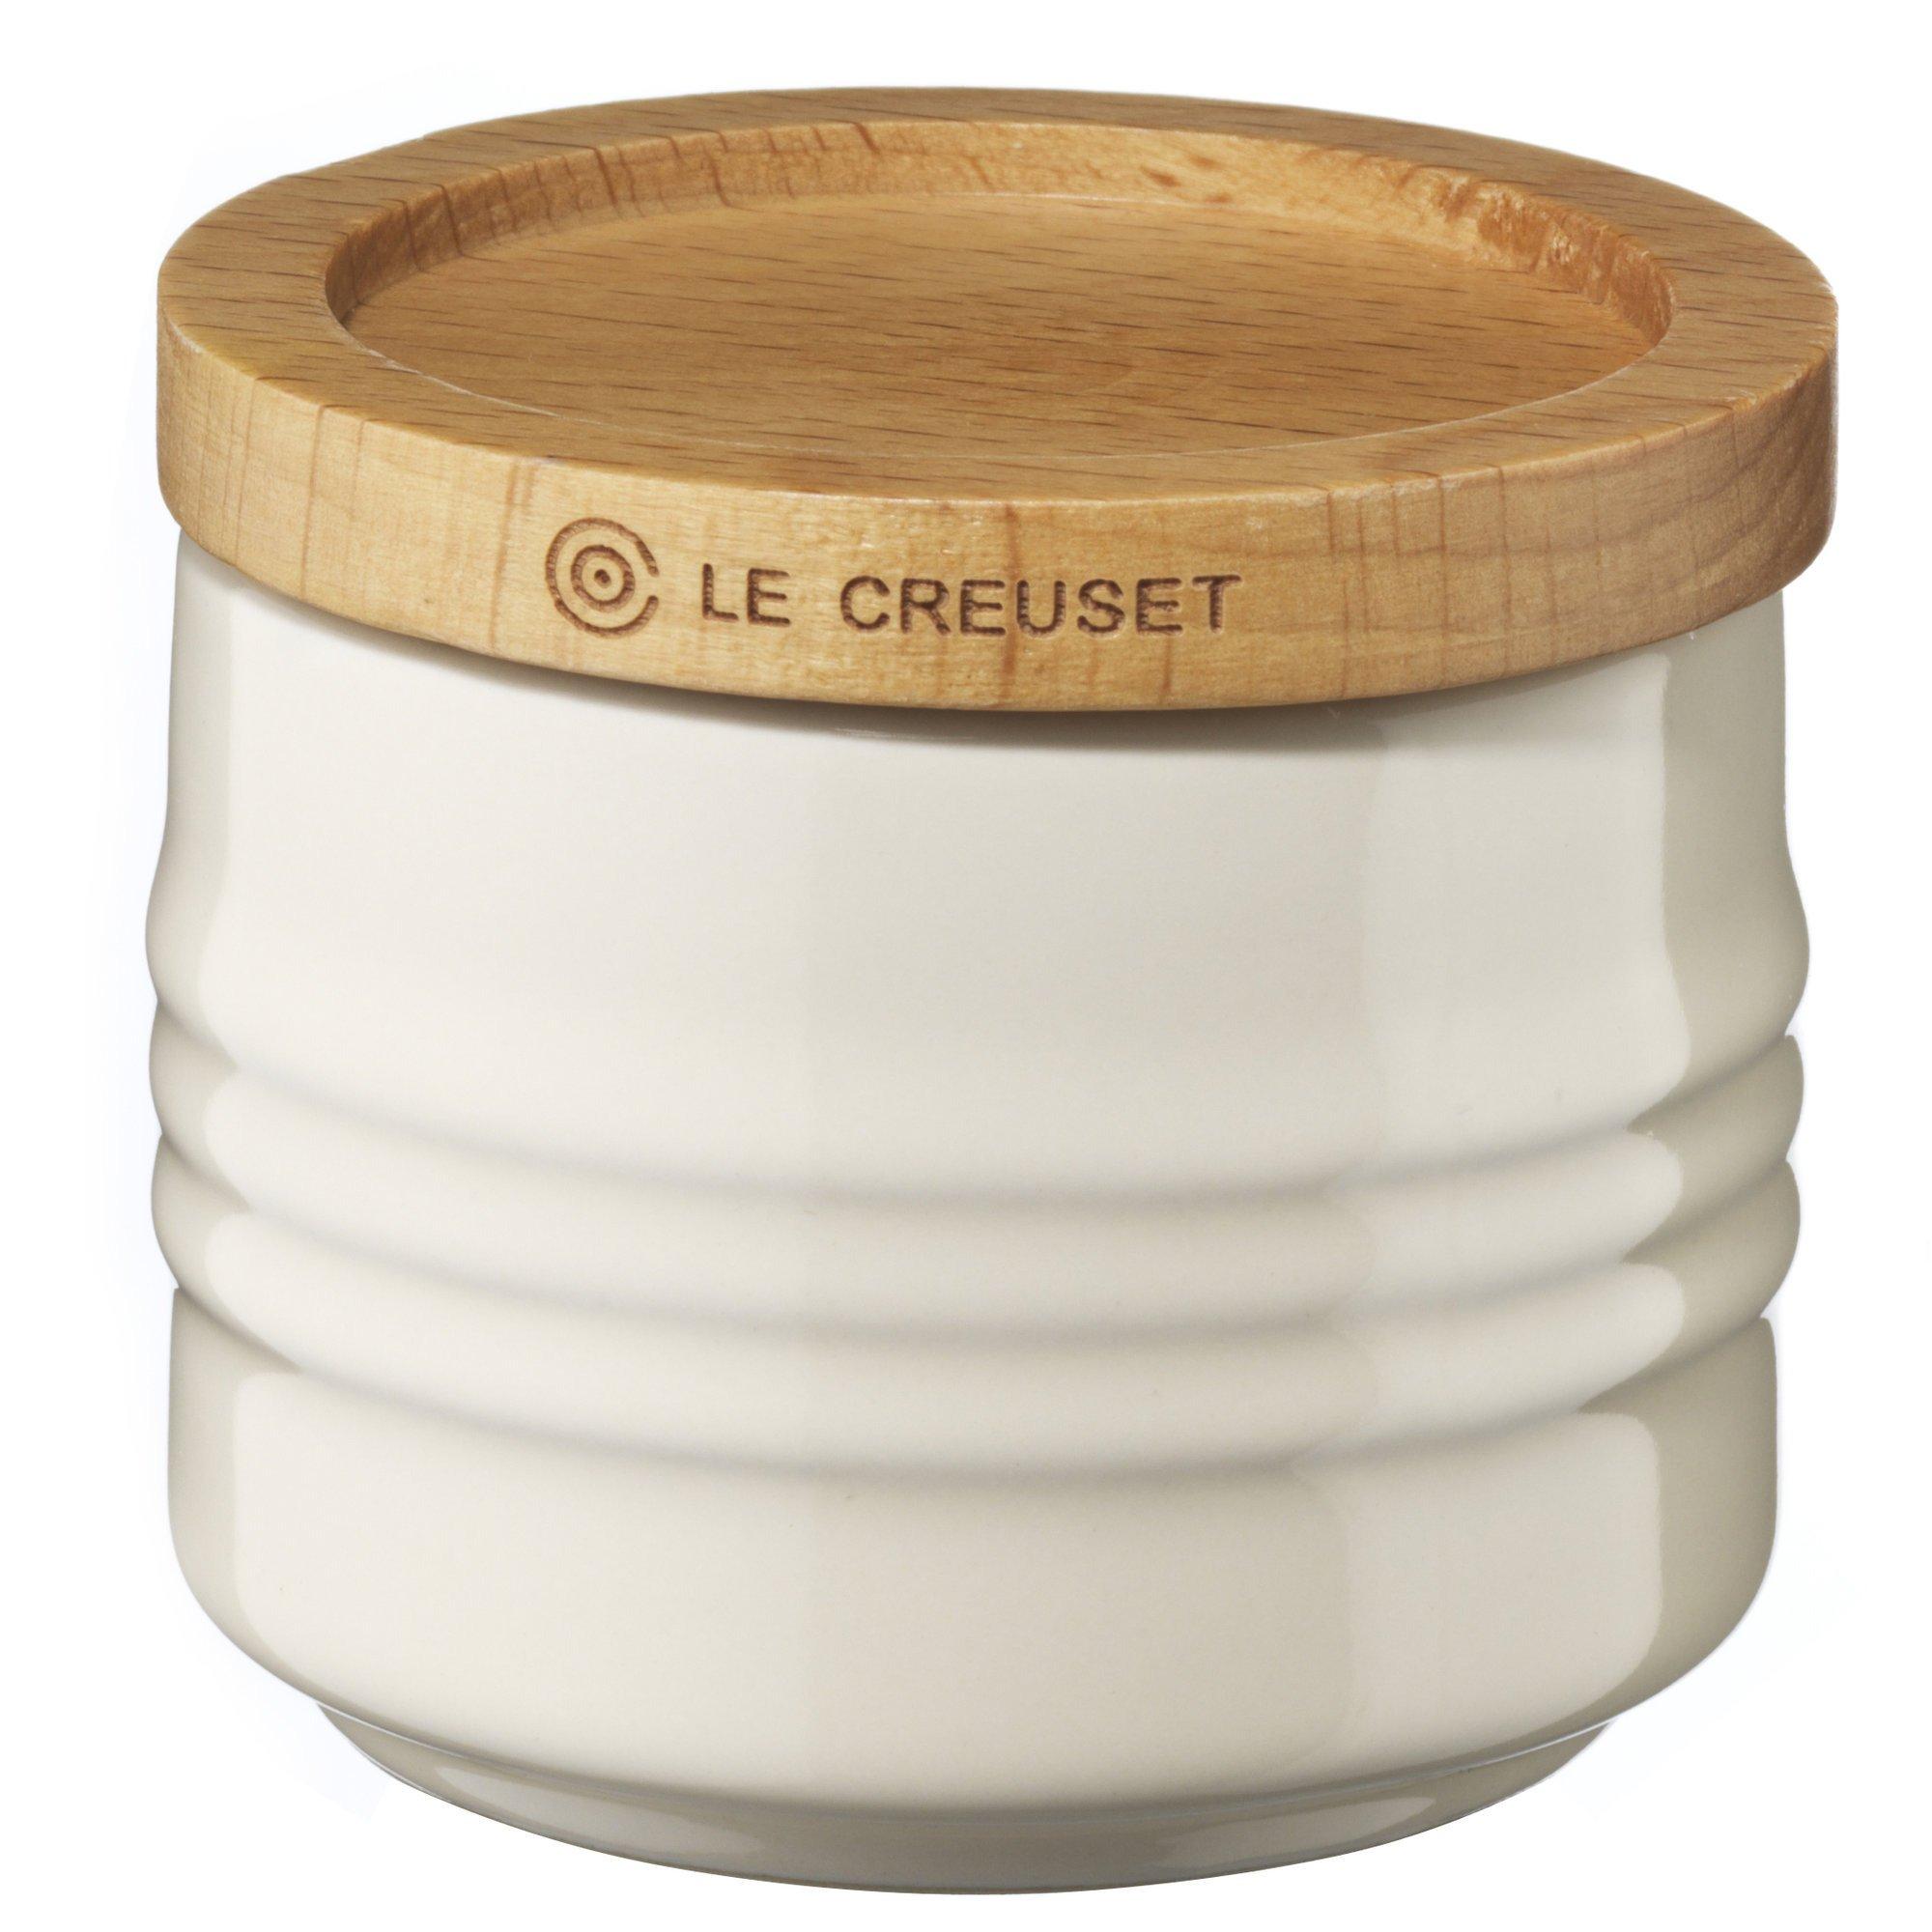 Le Creuset Liten kruka med trälock 80 ml Creme